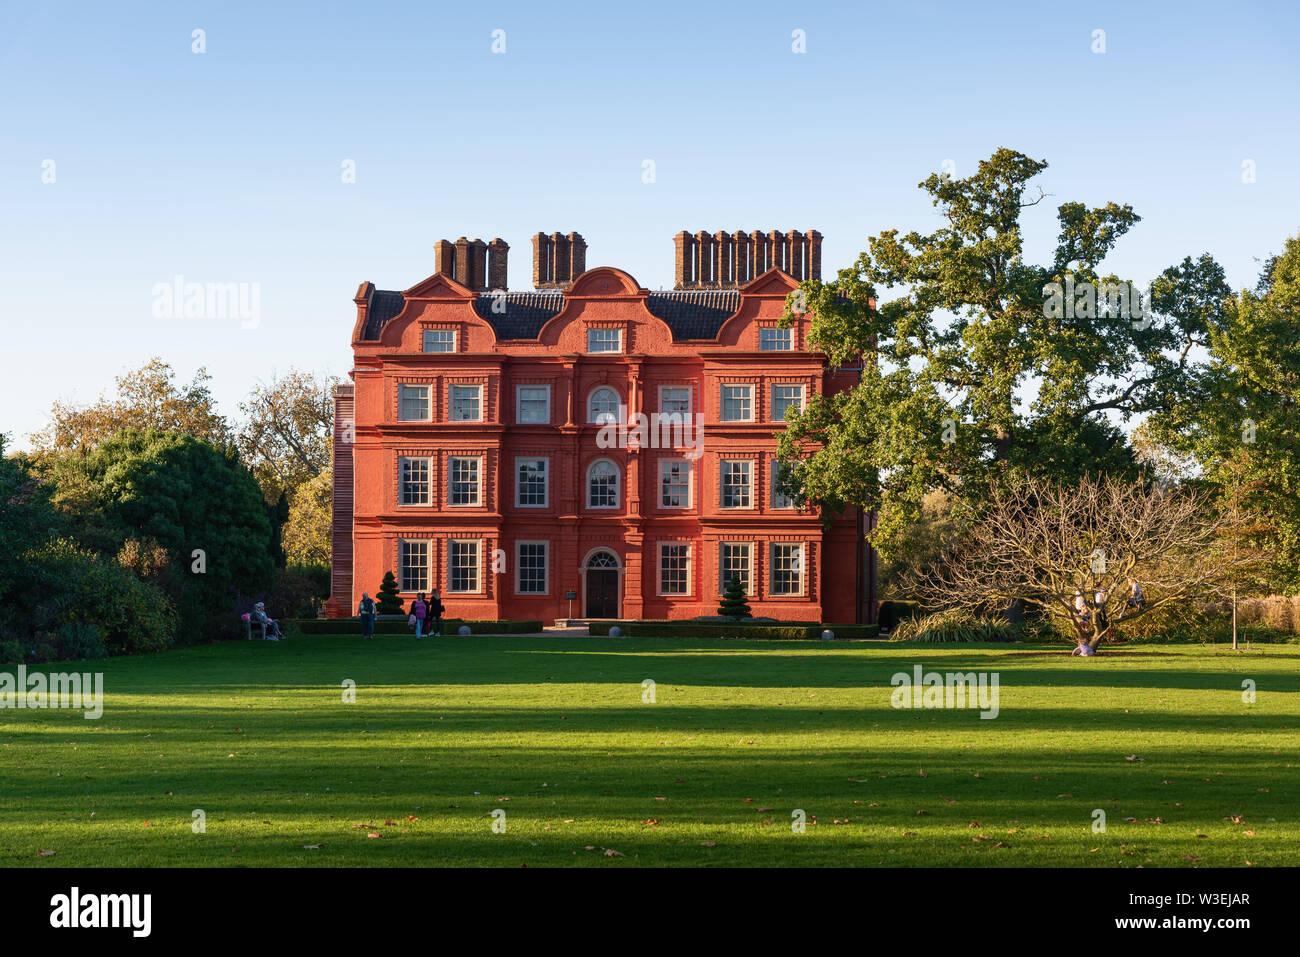 Palace, Kew Gardens, London, UK - Stock Image